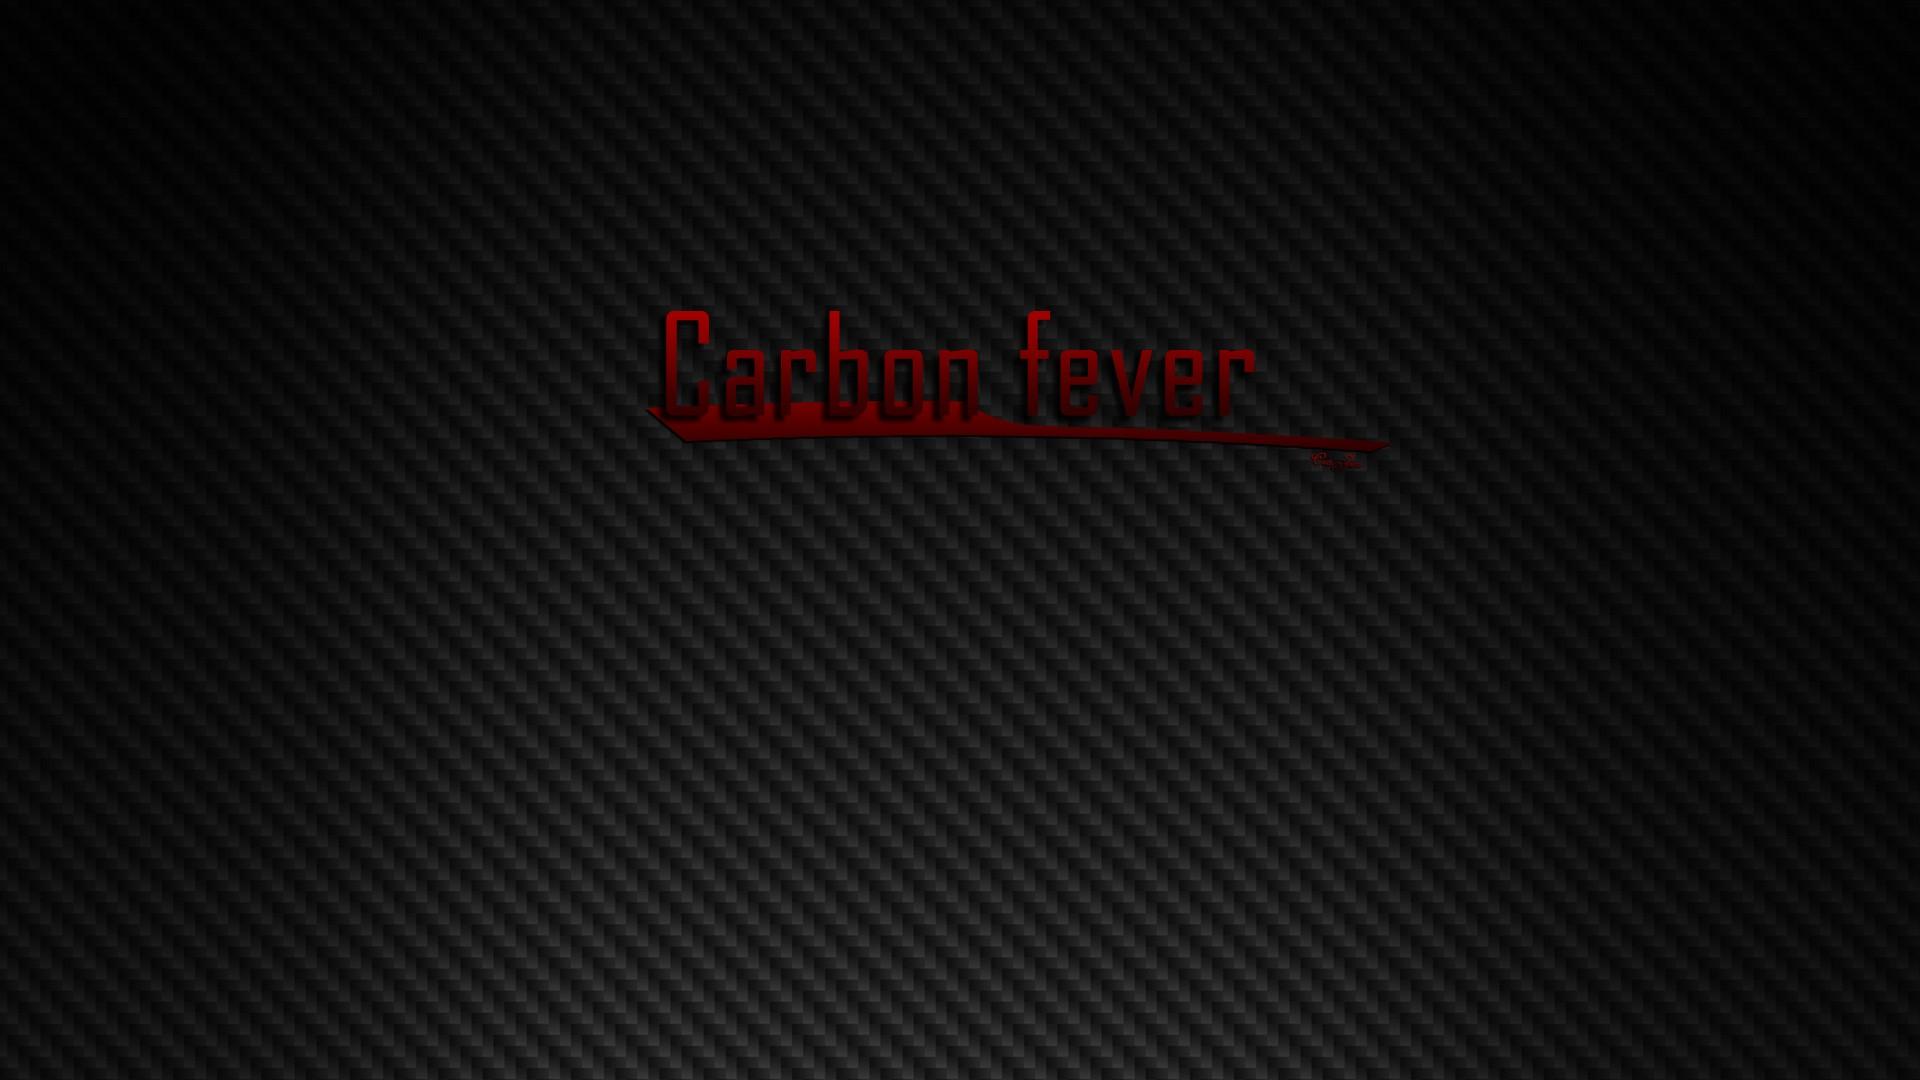 carbon fiber rx in the shadows myspace 225558 wallpaper wallpaper 1920x1080